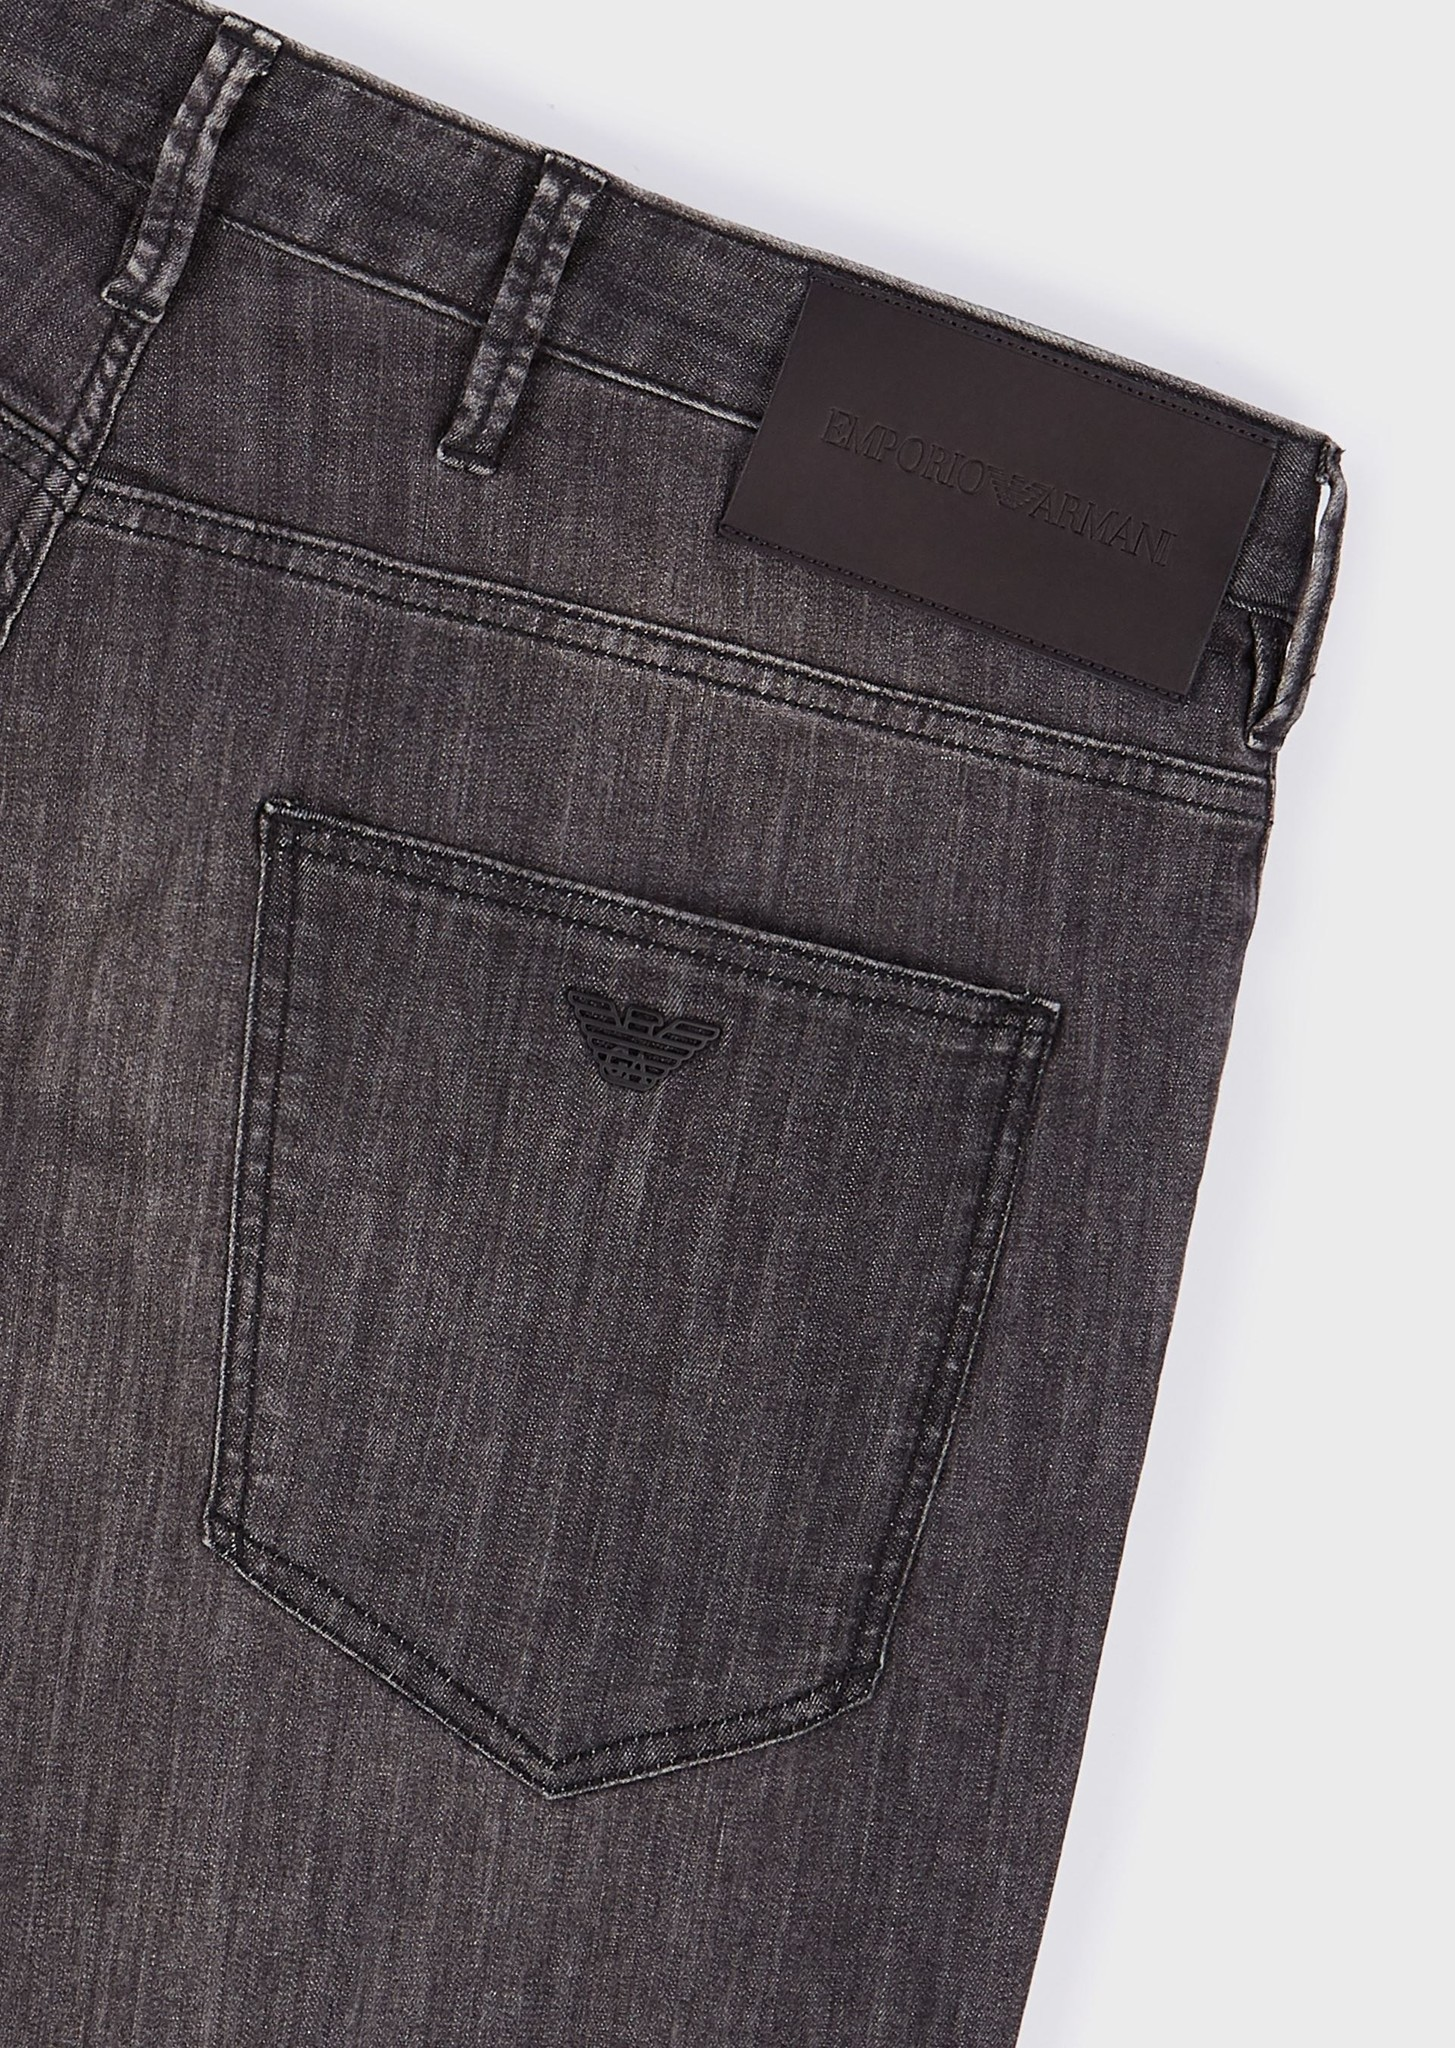 J75 Slim Fit Jeans-2